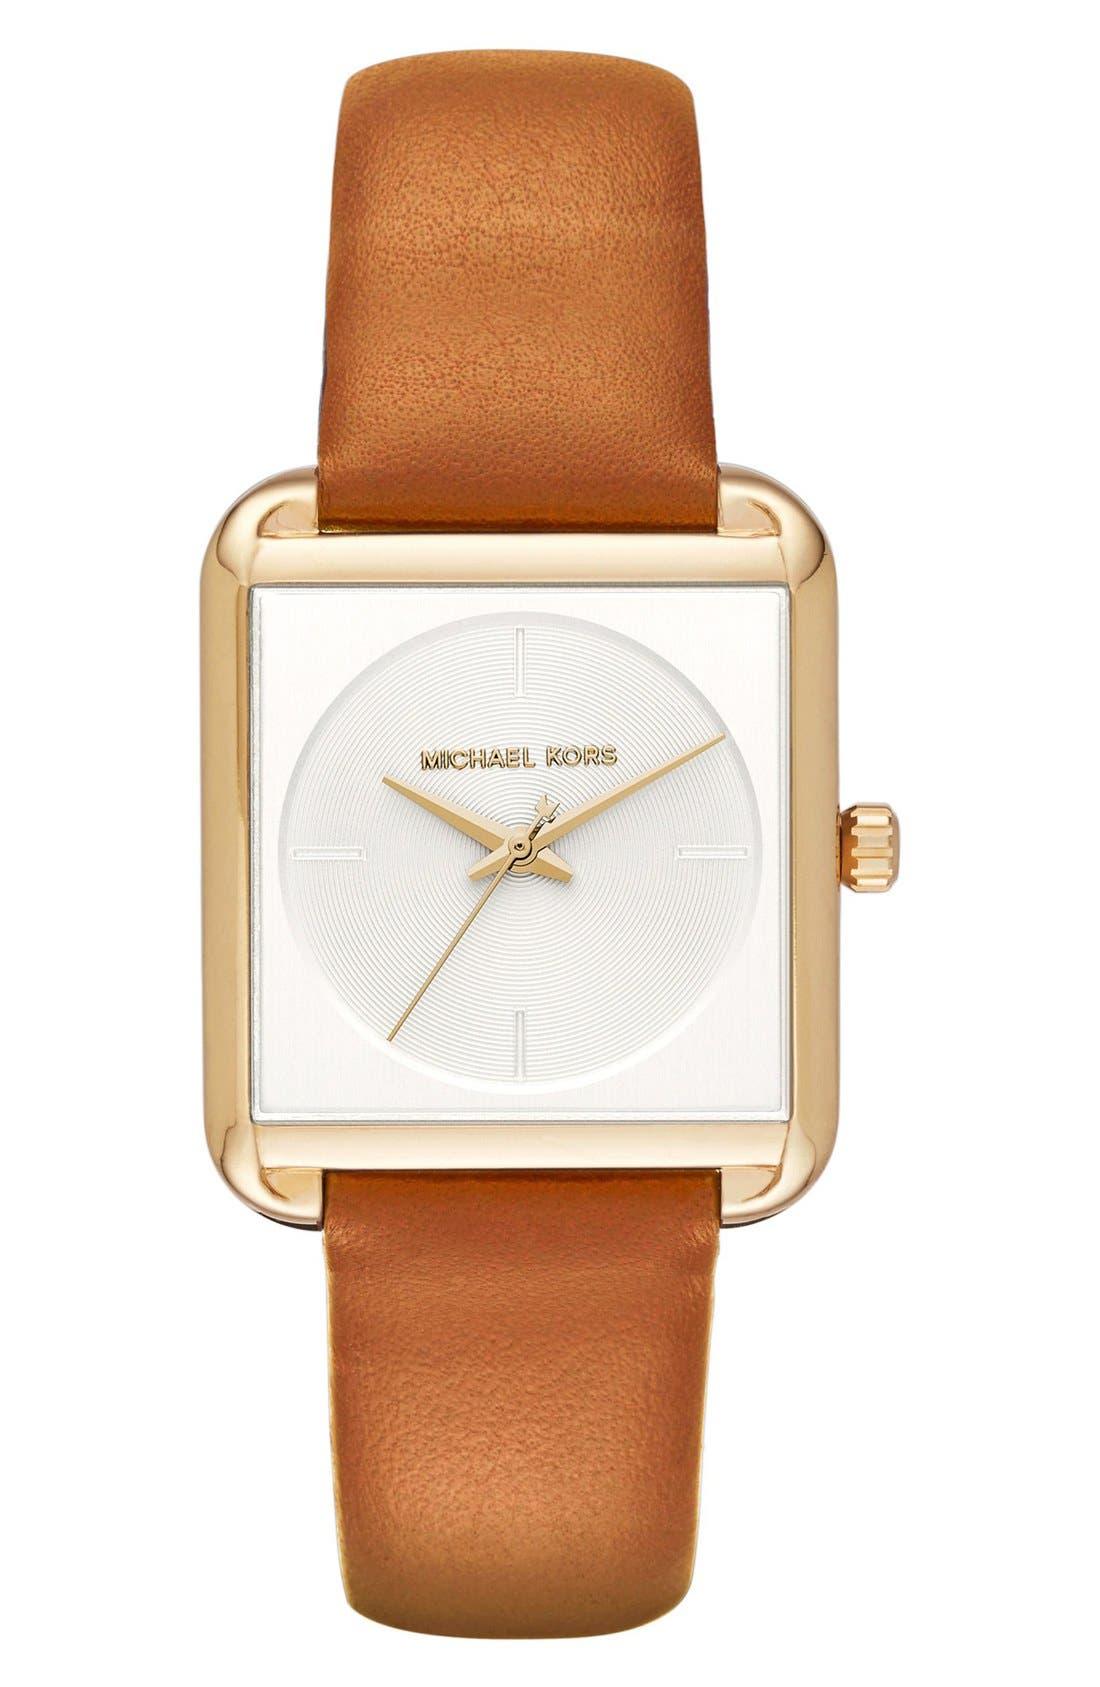 Main Image - Michael Kors 'Lake' Leather Strap Watch, 32mm x 39mm